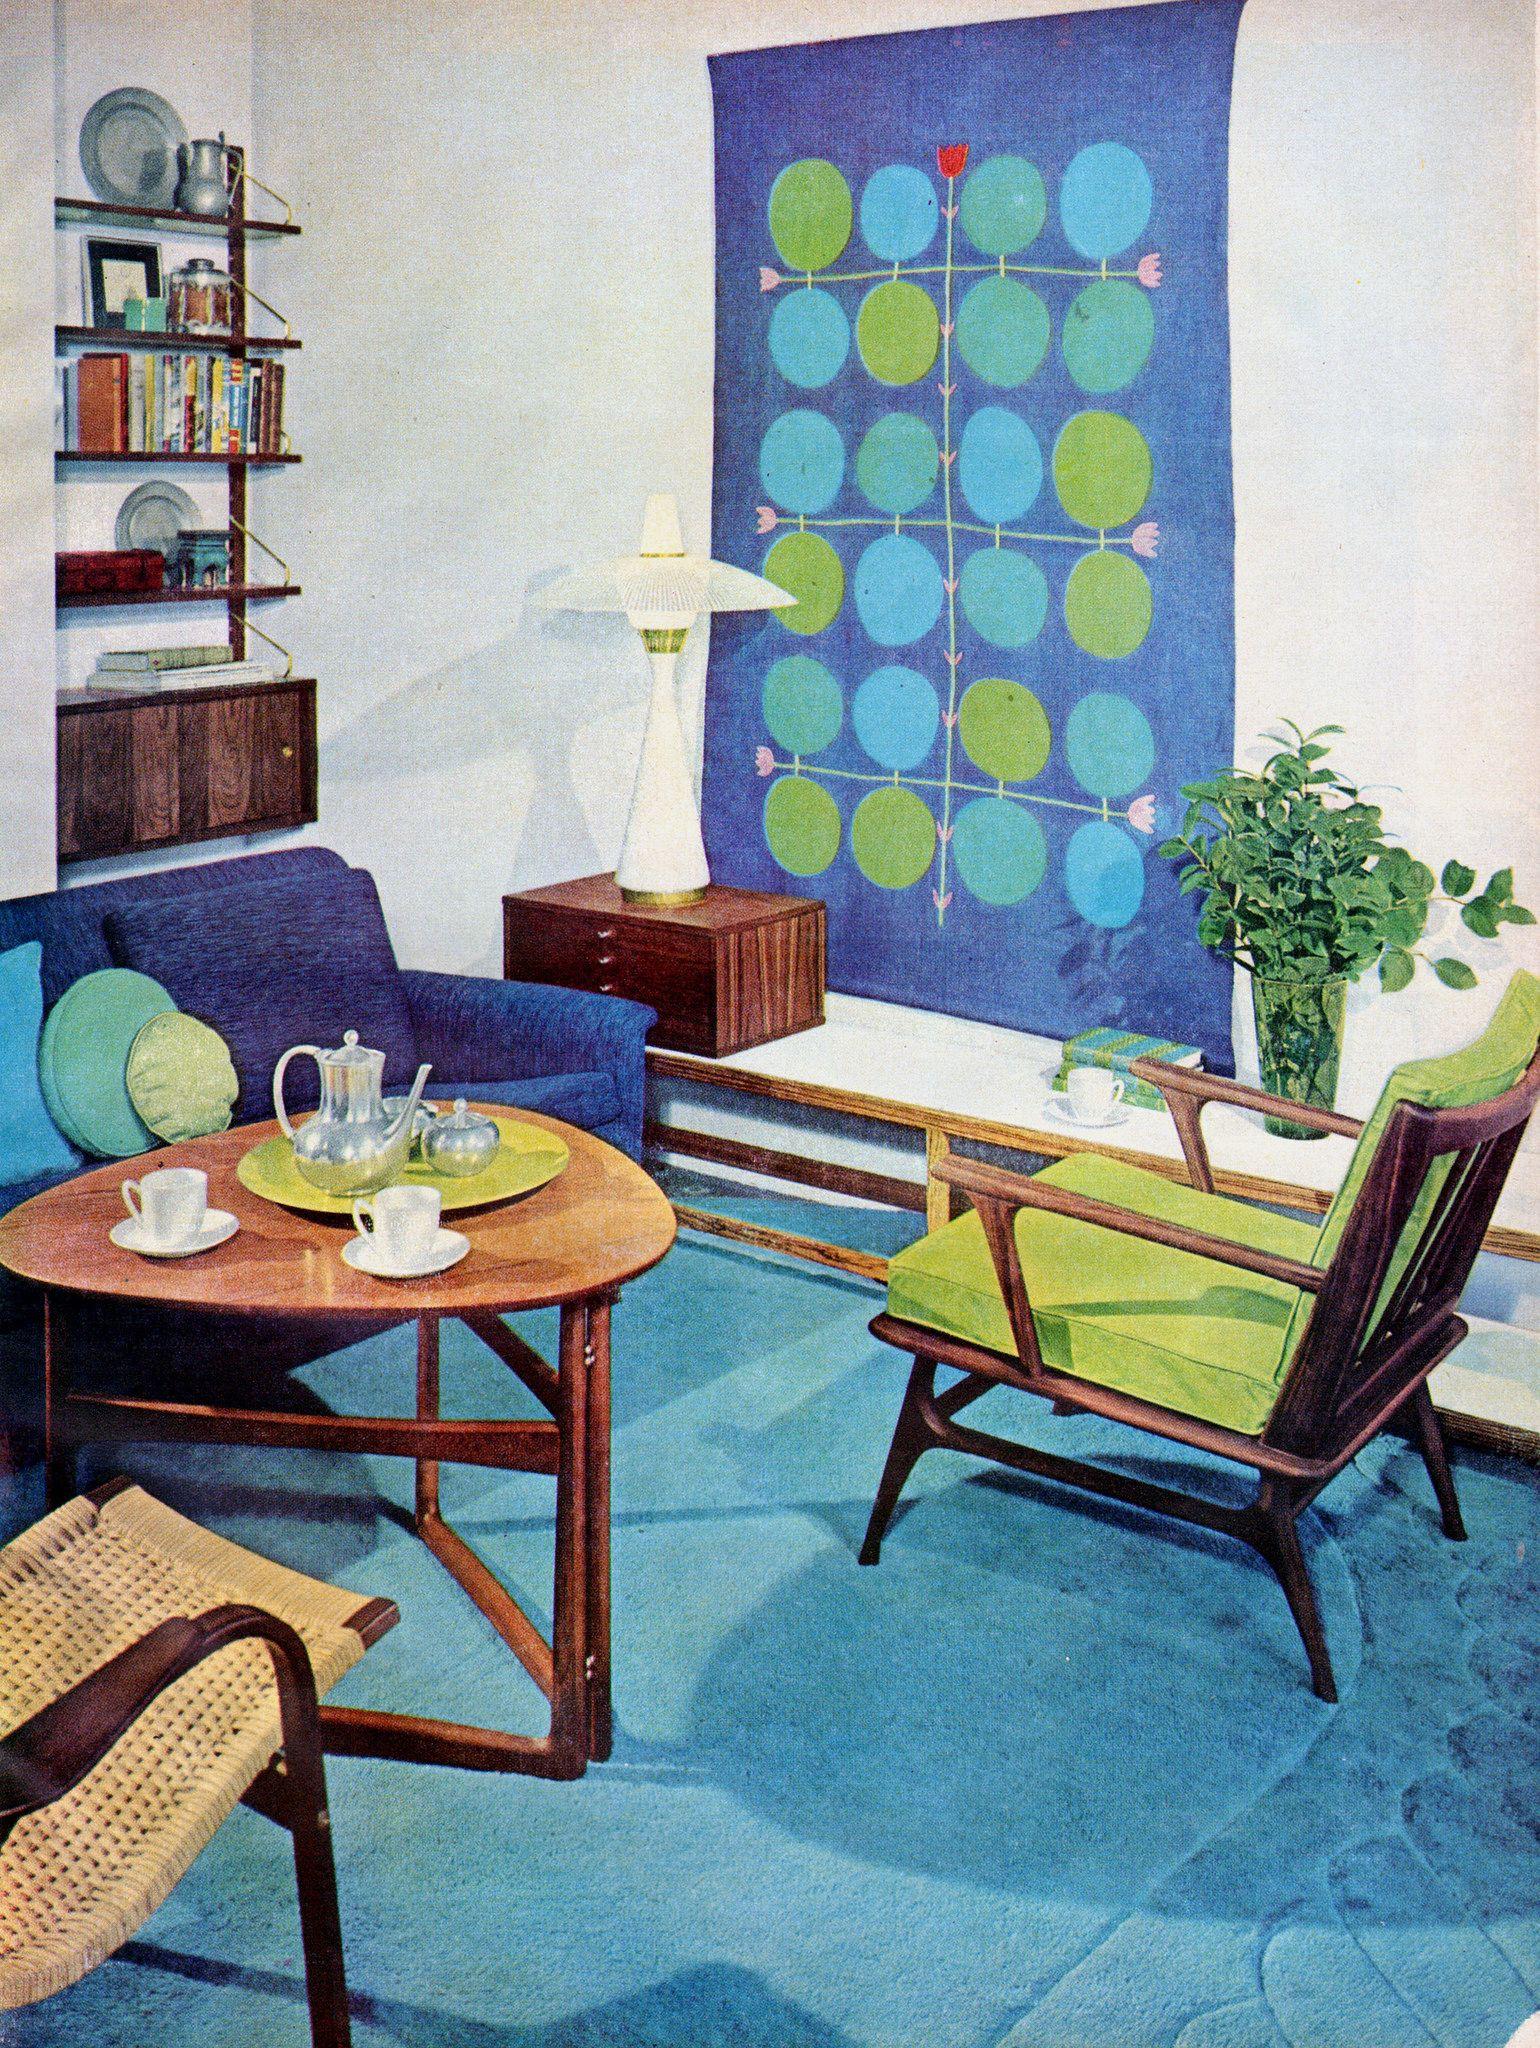 Httpsflickrpcn3Iqu - Modern Room 1958